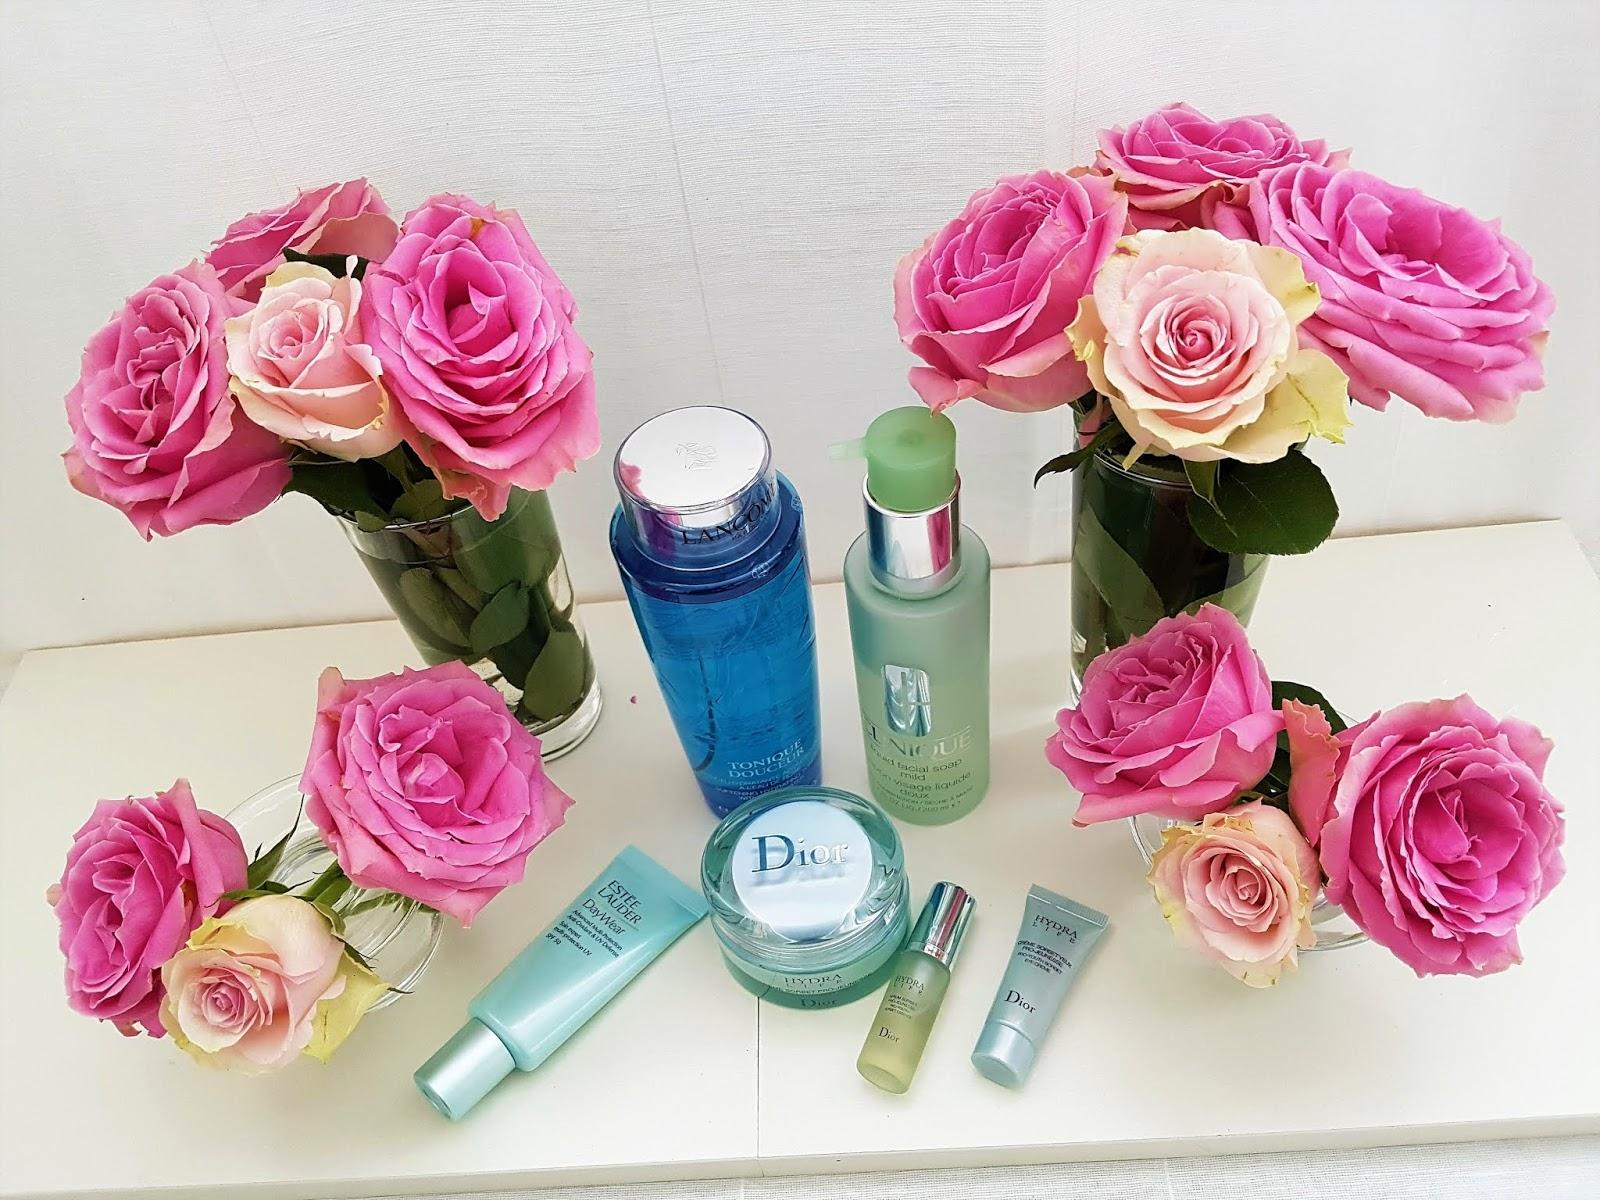 Liquid Facial Soap - Oily Skin Formula by Clinique #4